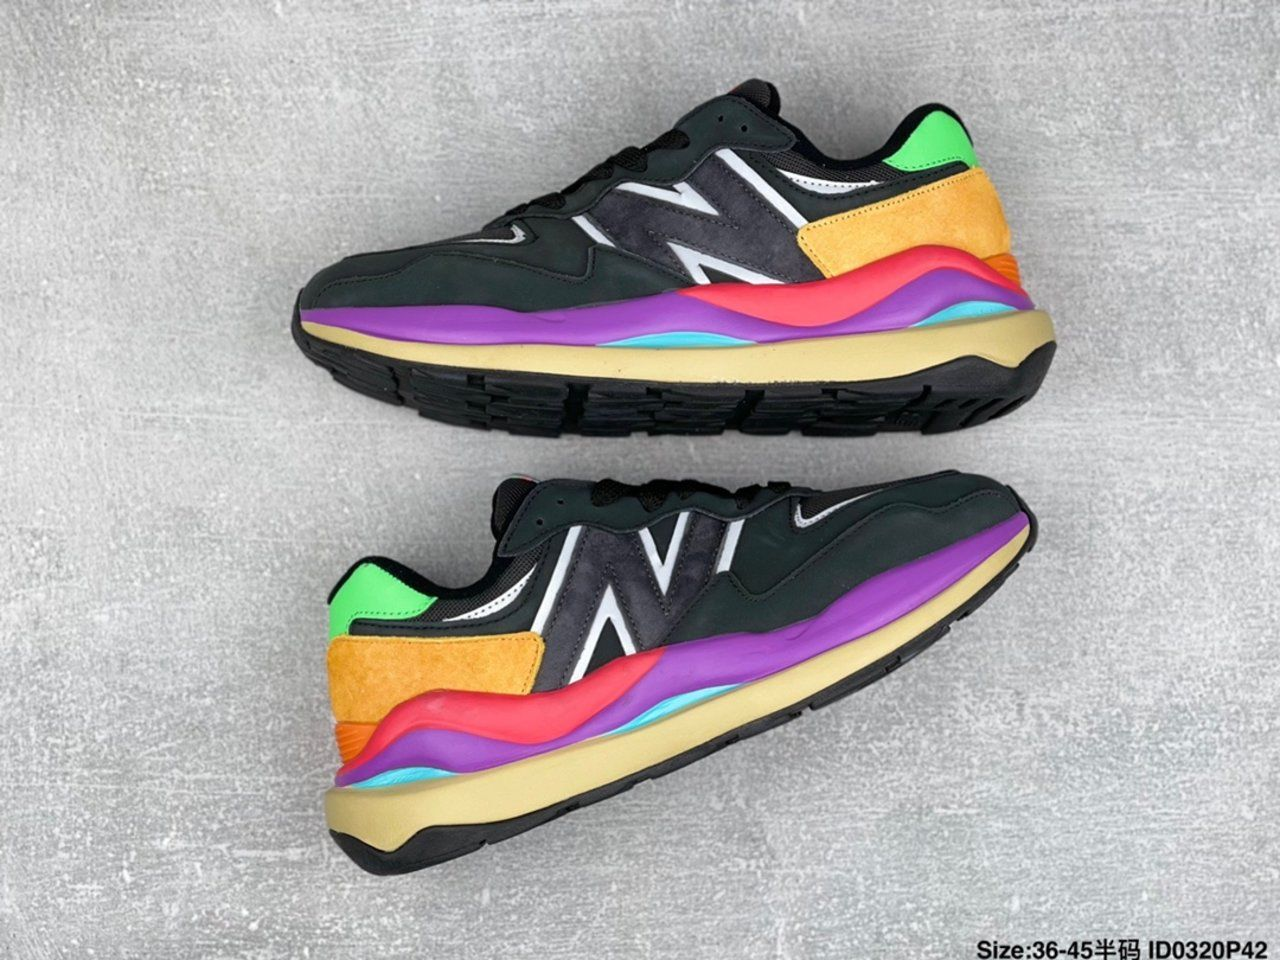 New Balance jogging shoes M5740LB side